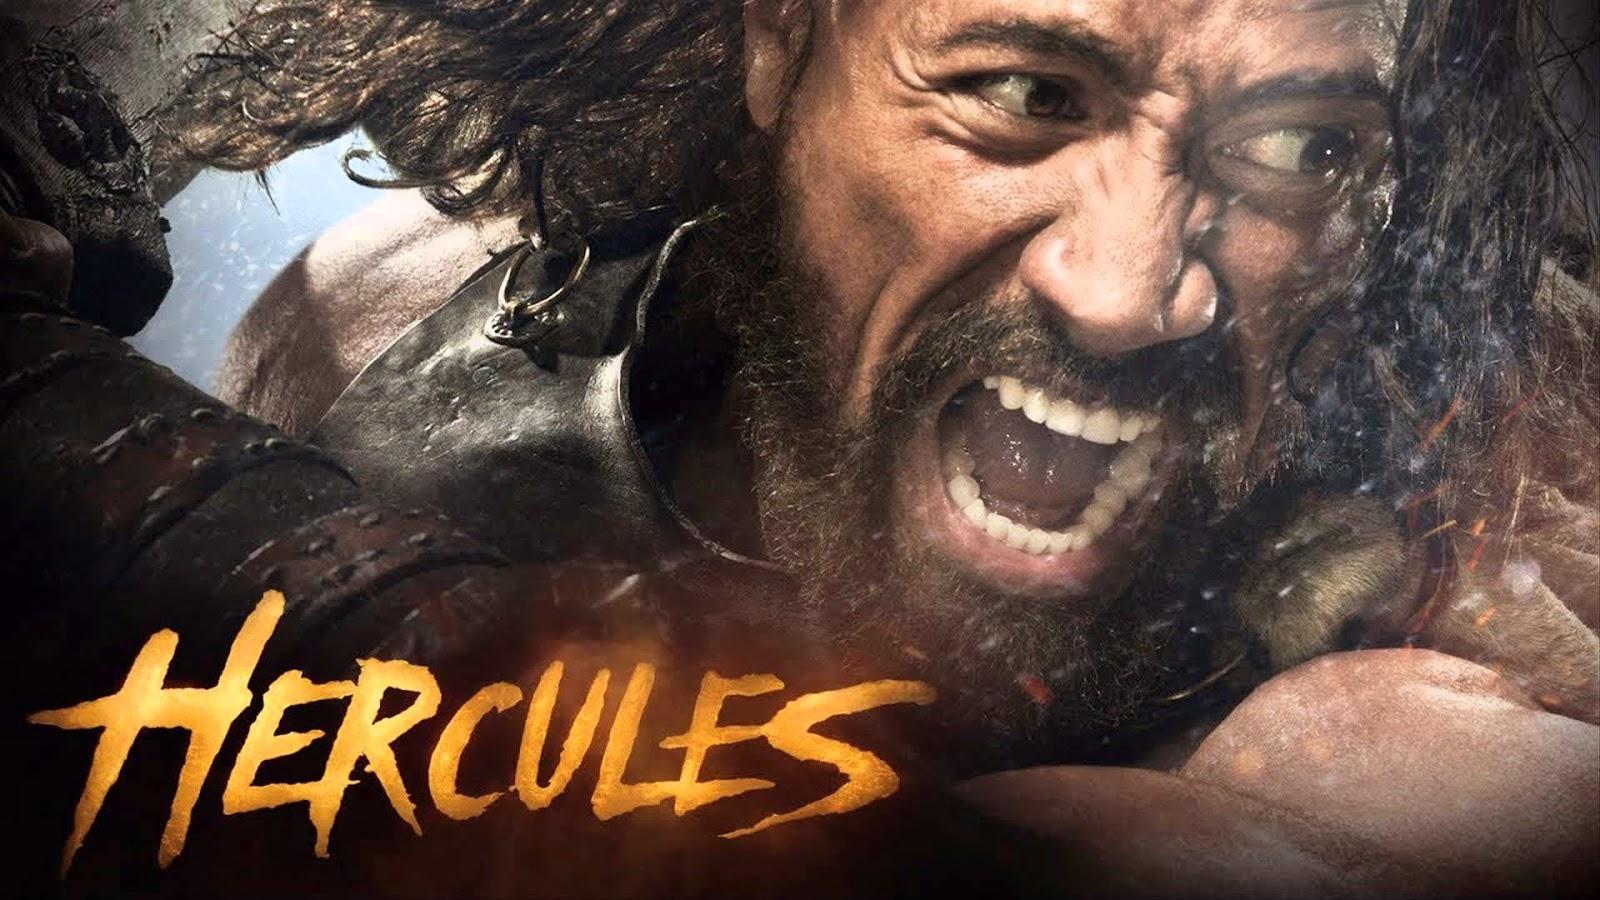 dwayne johnson in hercules wallpapers - Dwayne Johnson The Rock In Hercules Movie 2015 Hd